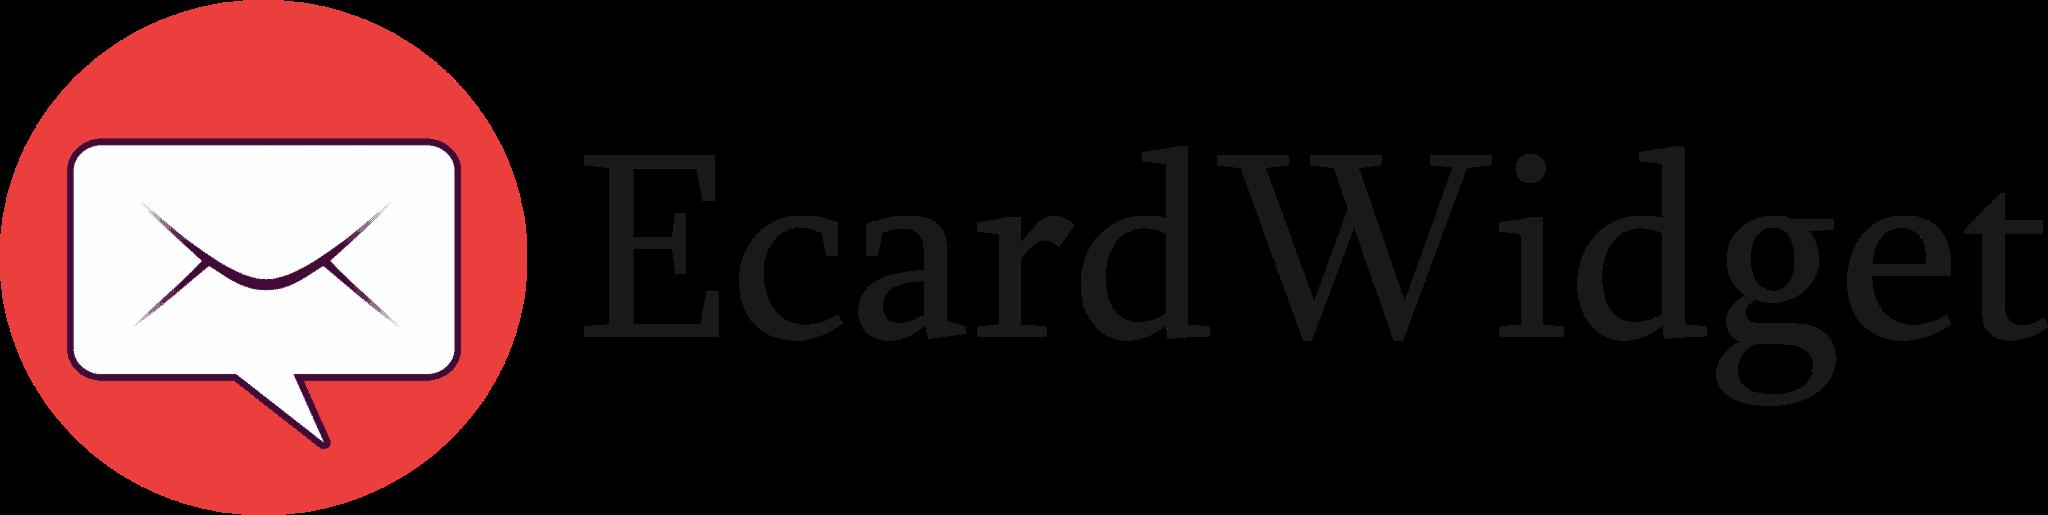 EcardWidget